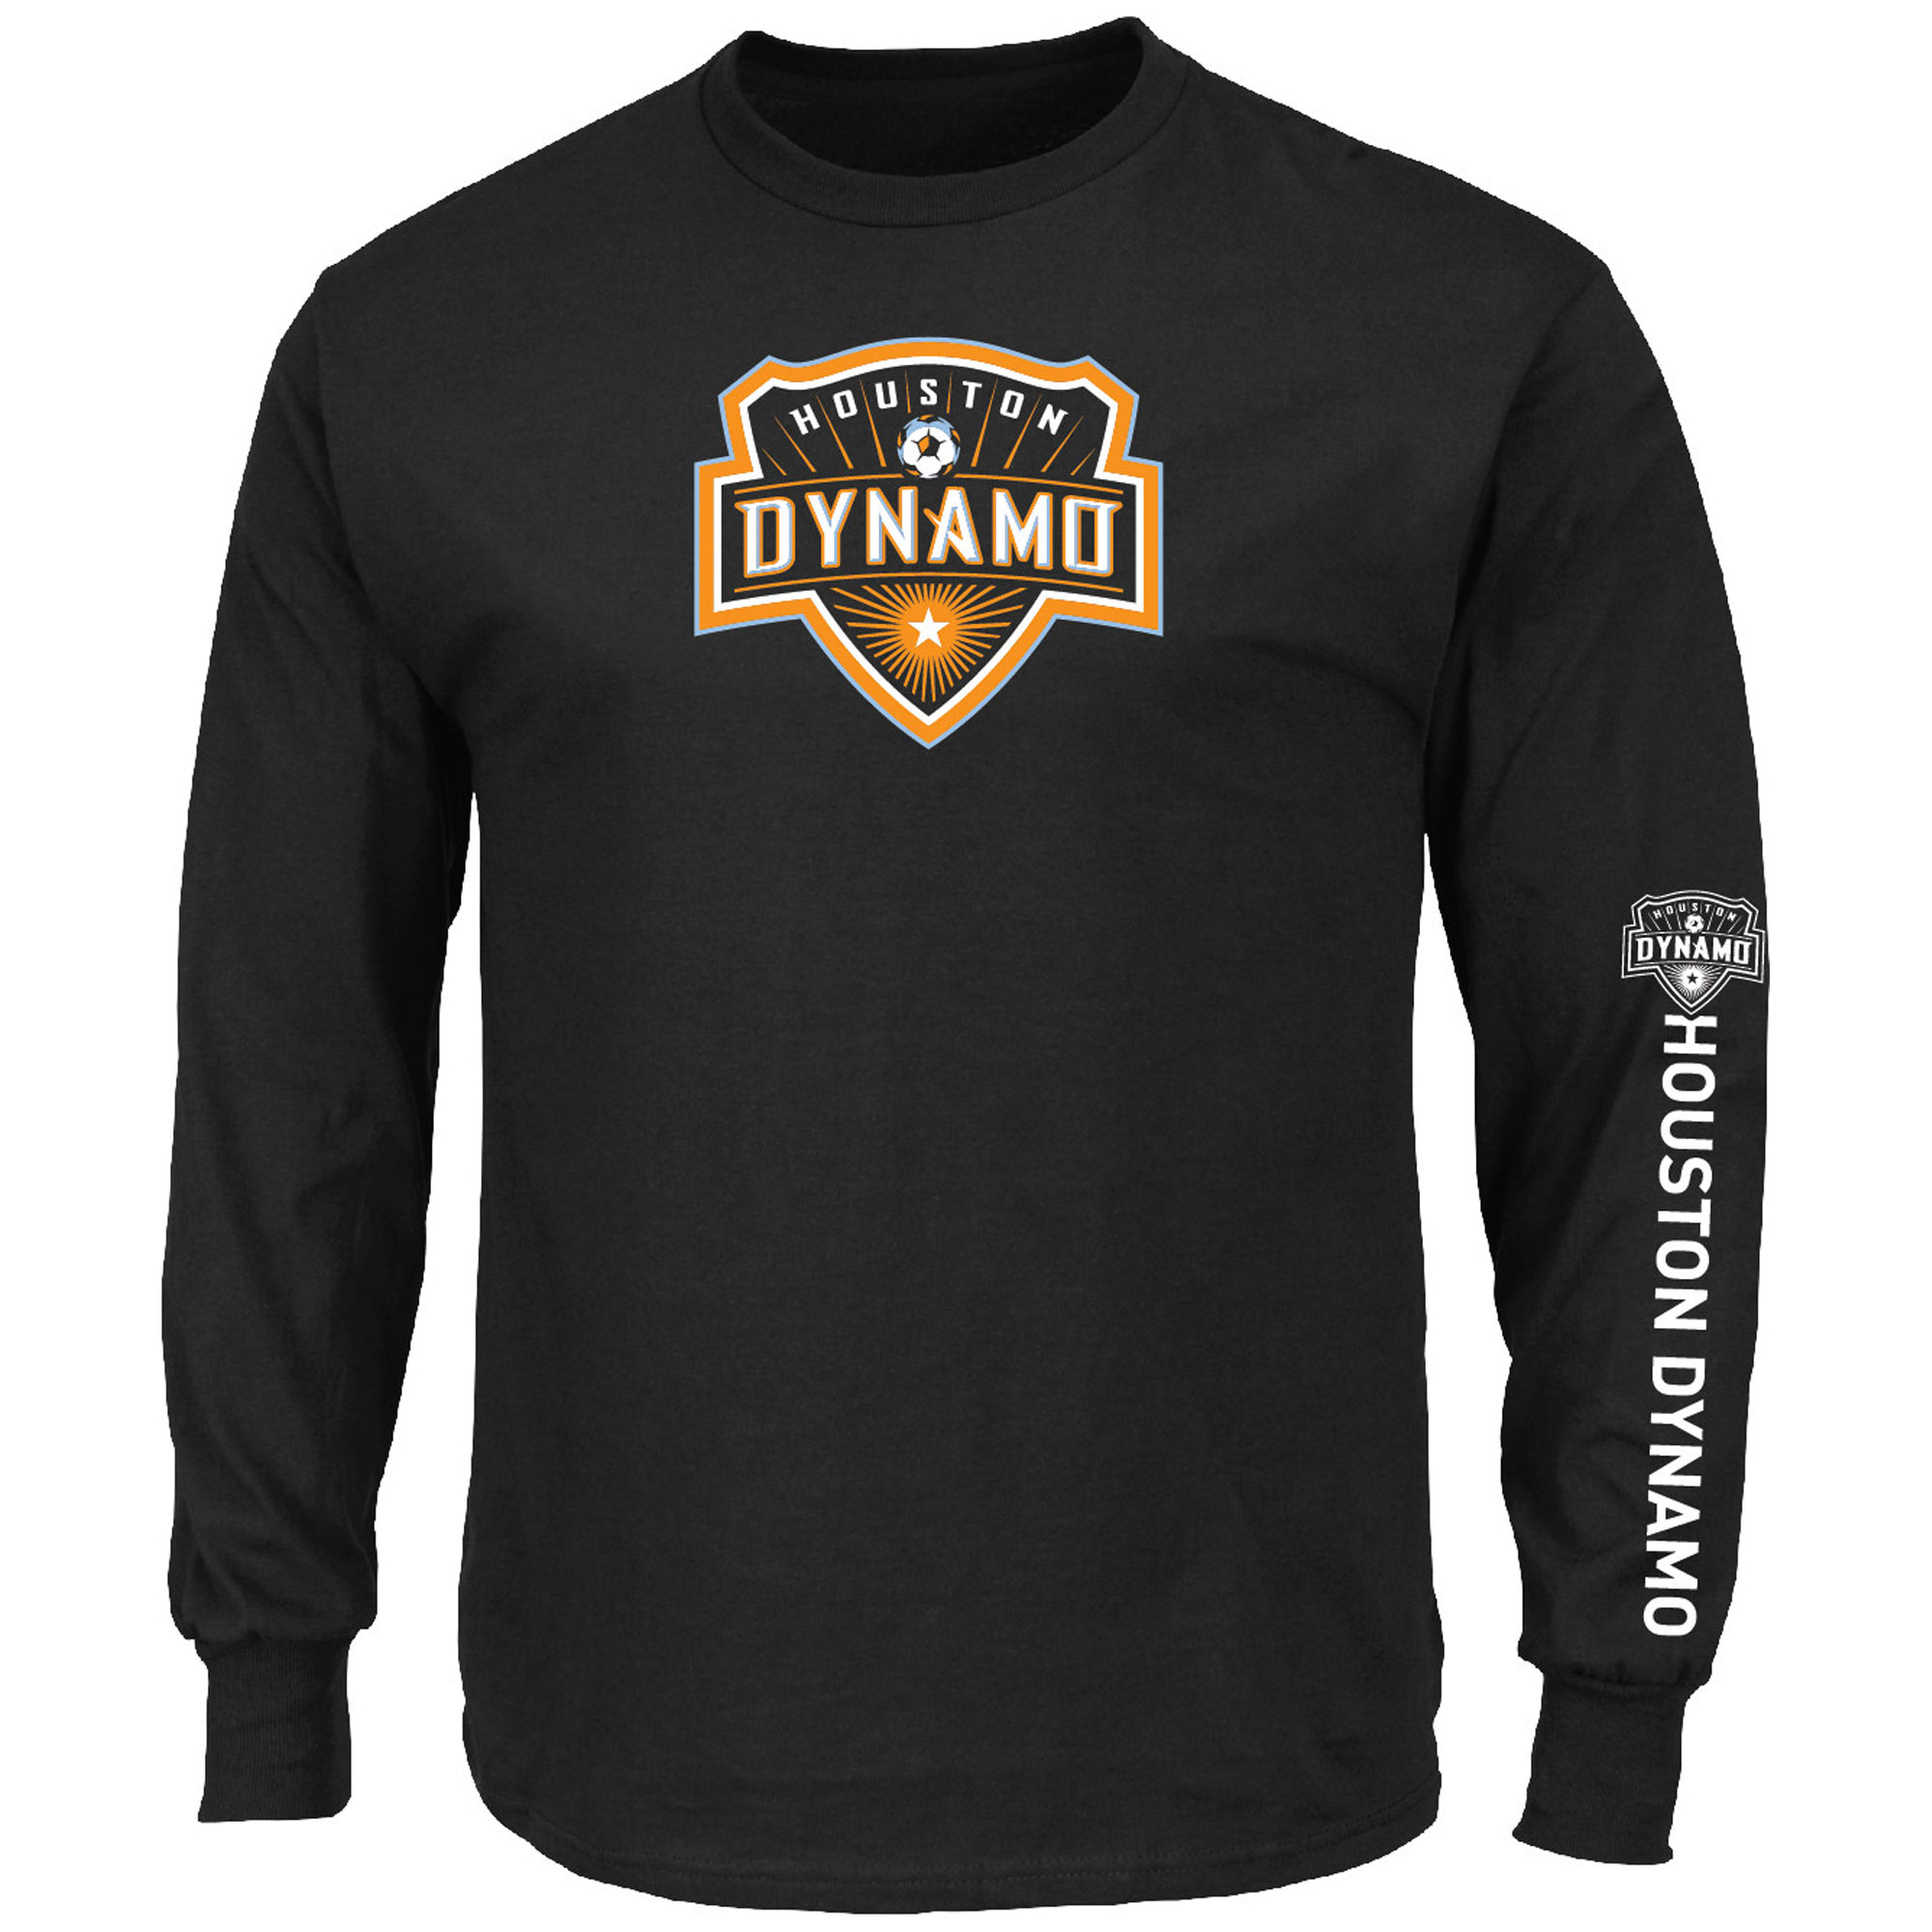 Houston Dynamo Majestic Global Sensation Big & Tall Long Sleeve T-Shirt - Black